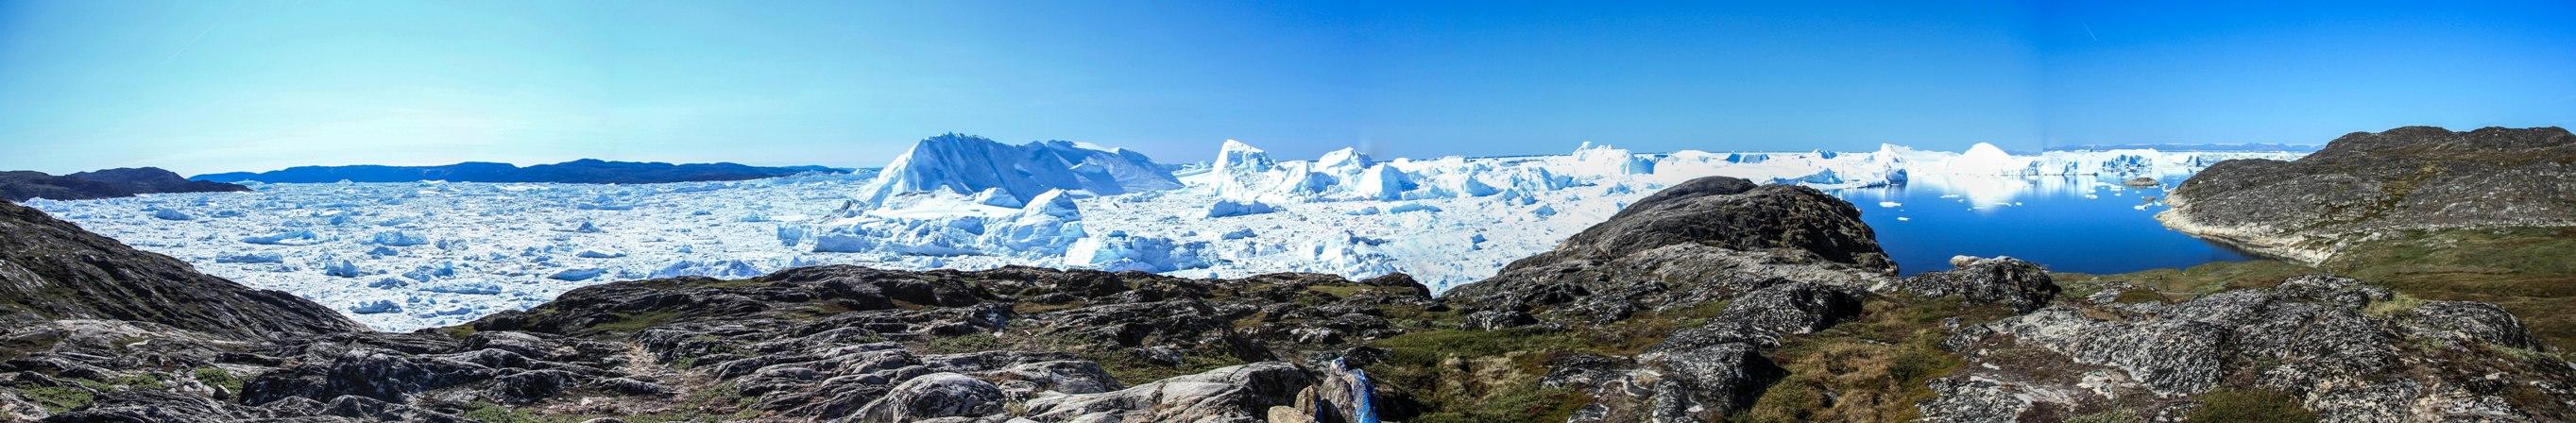 Icefjord